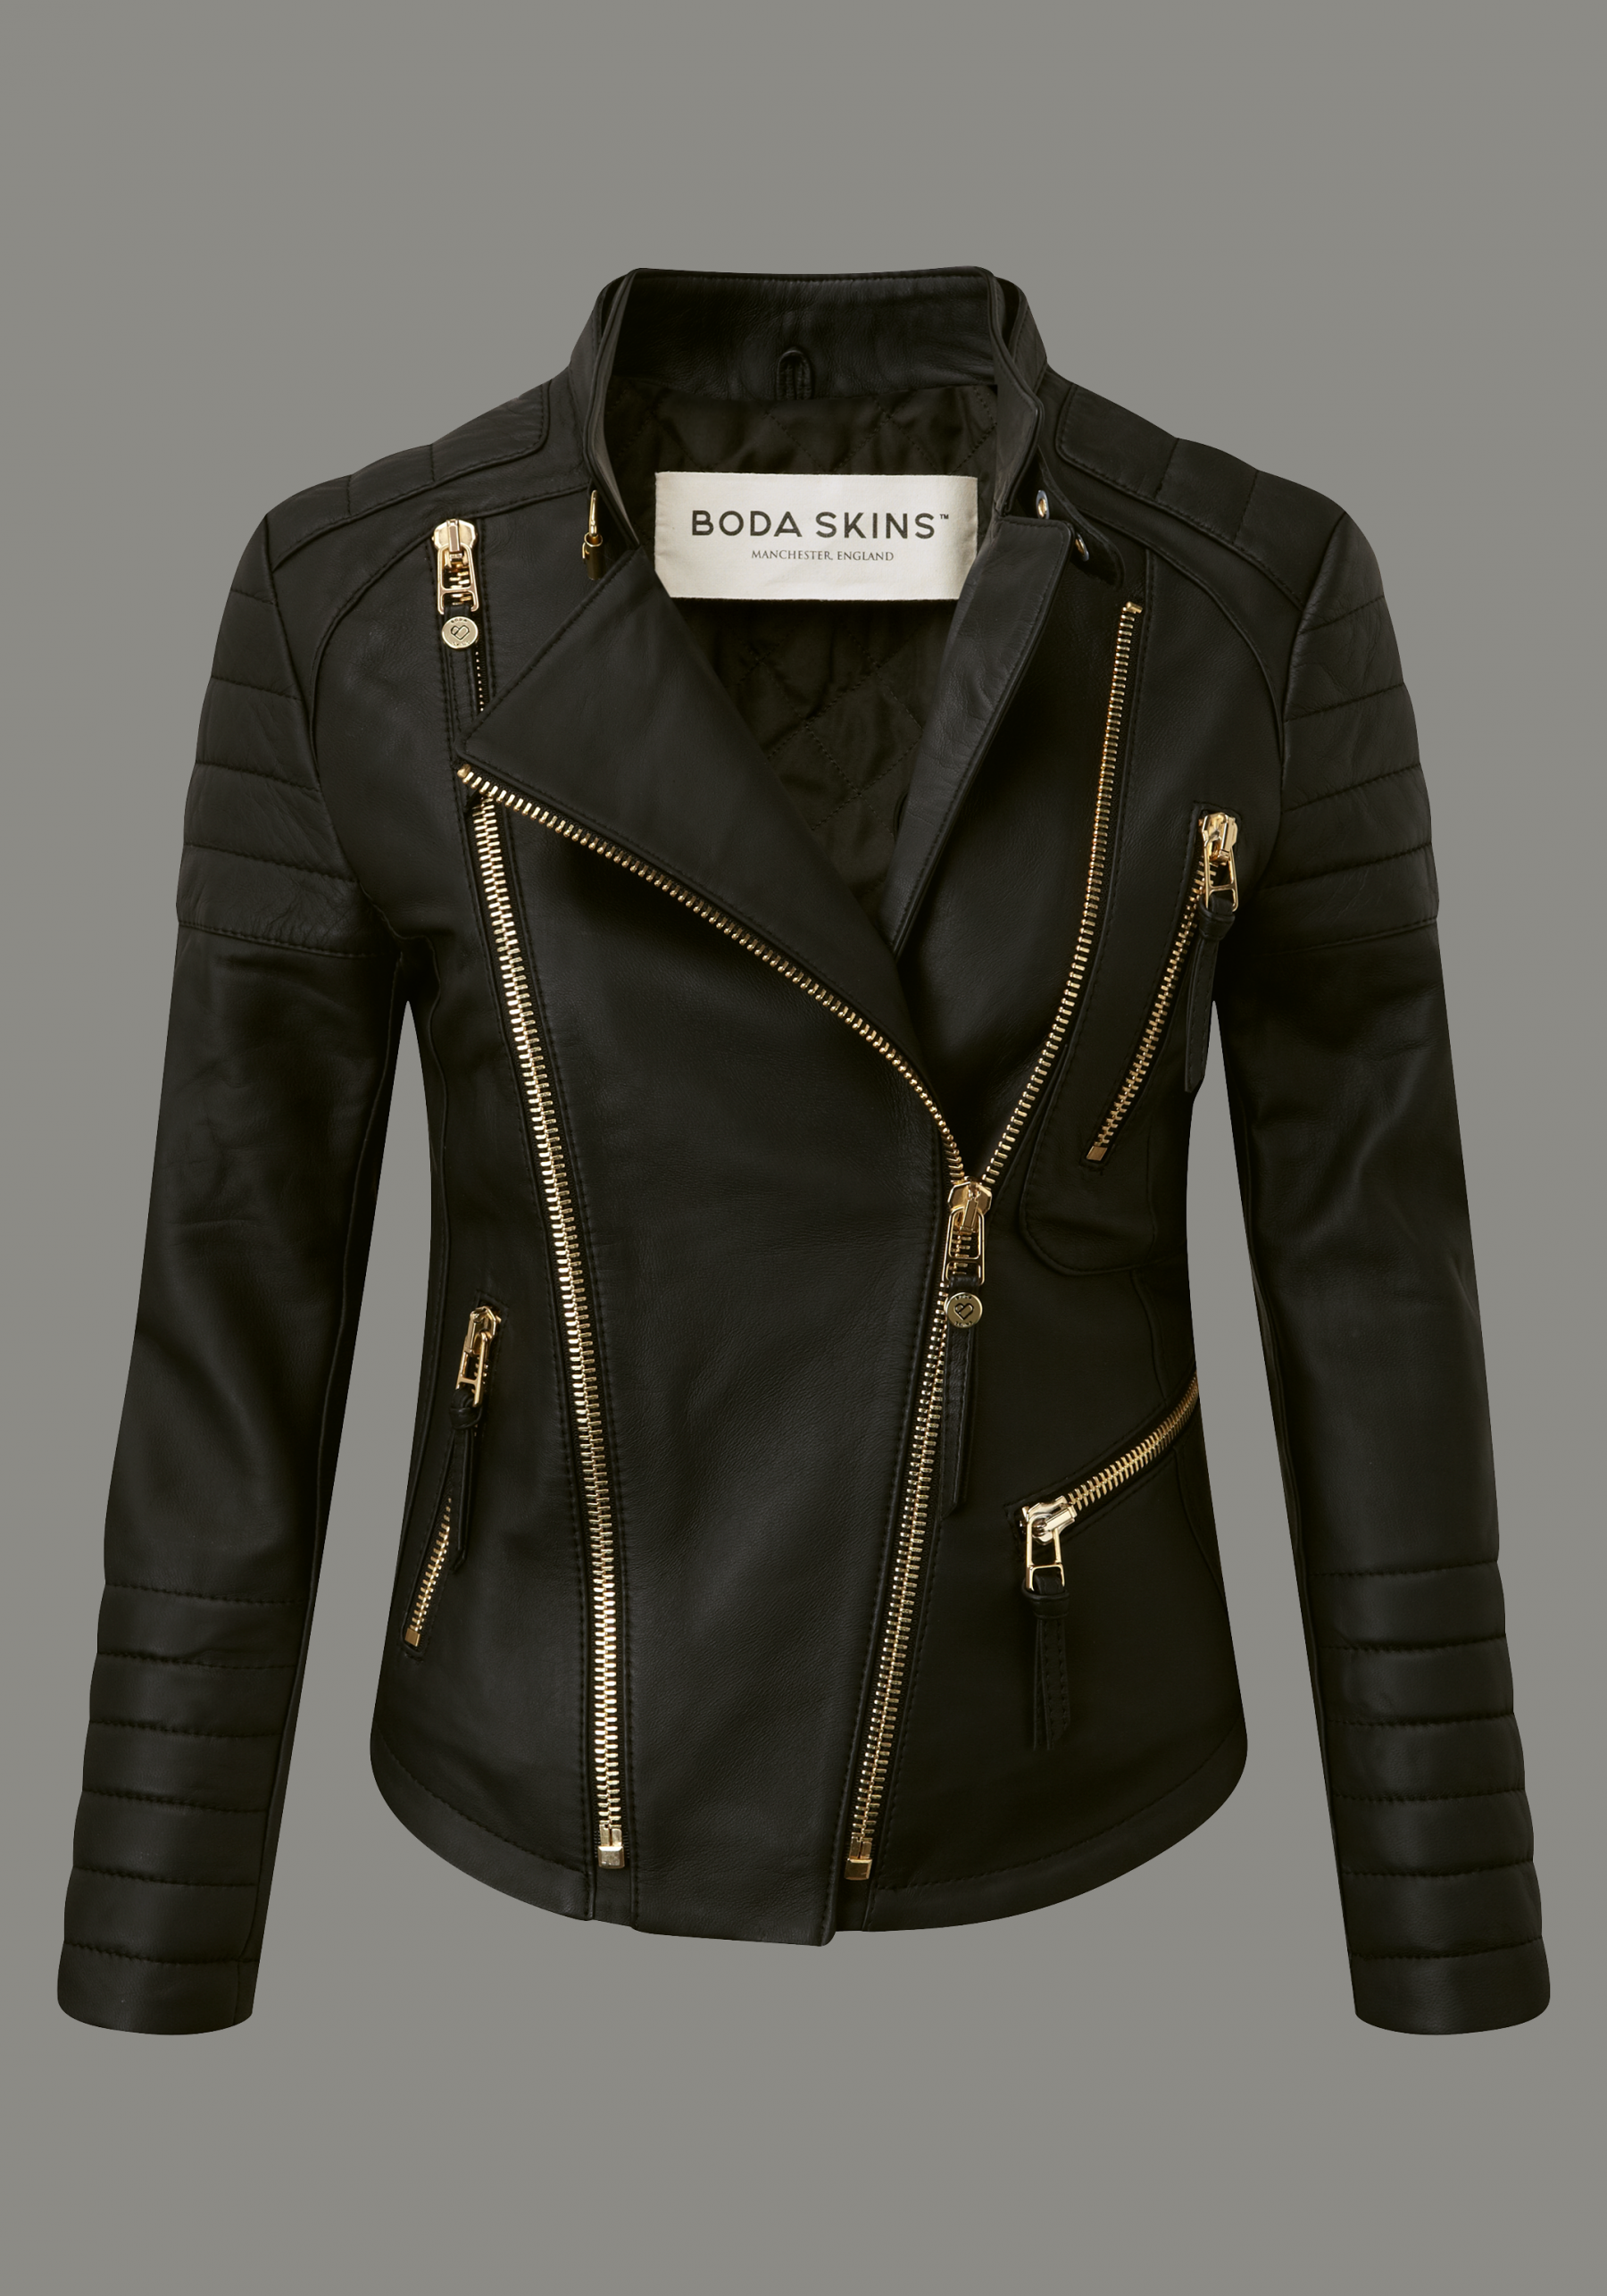 Luna V.2 (Gold Hardware) - Jackets - Women - Boda Skins | Fabulous ...